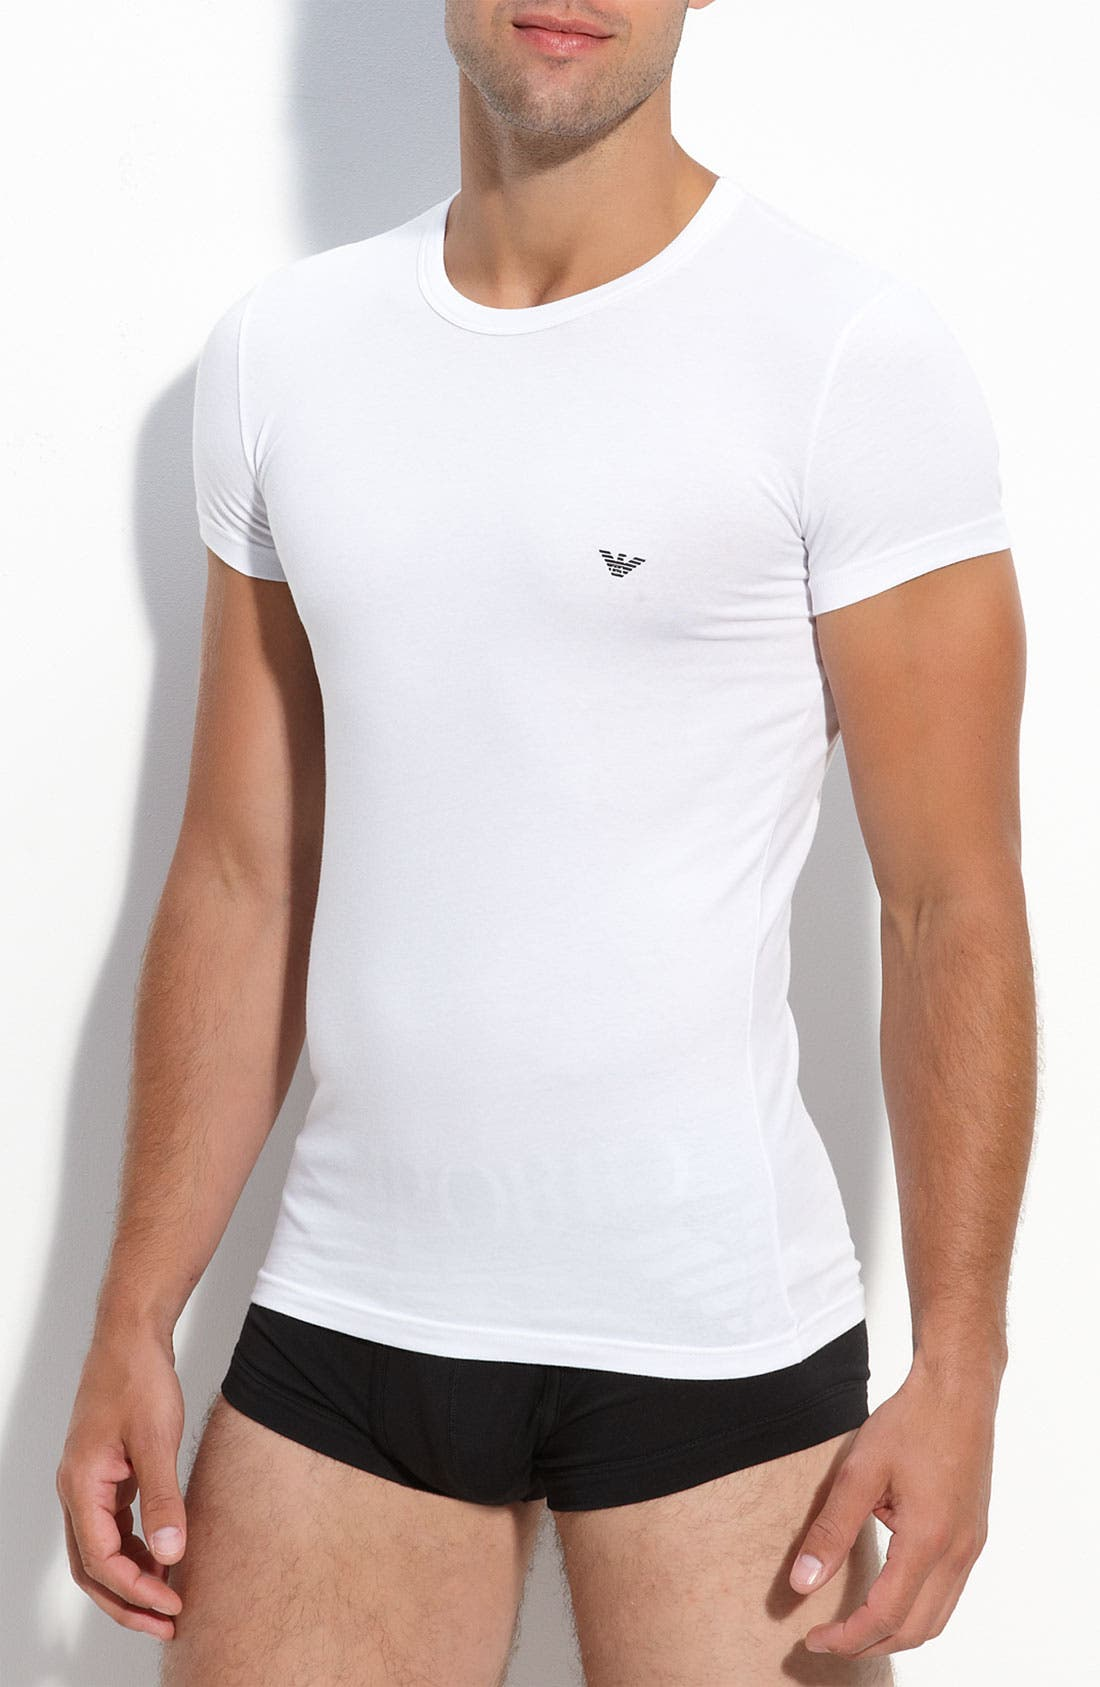 Alternate Image 1 Selected - Emporio Armani 'Eagle' Crewneck T-Shirt